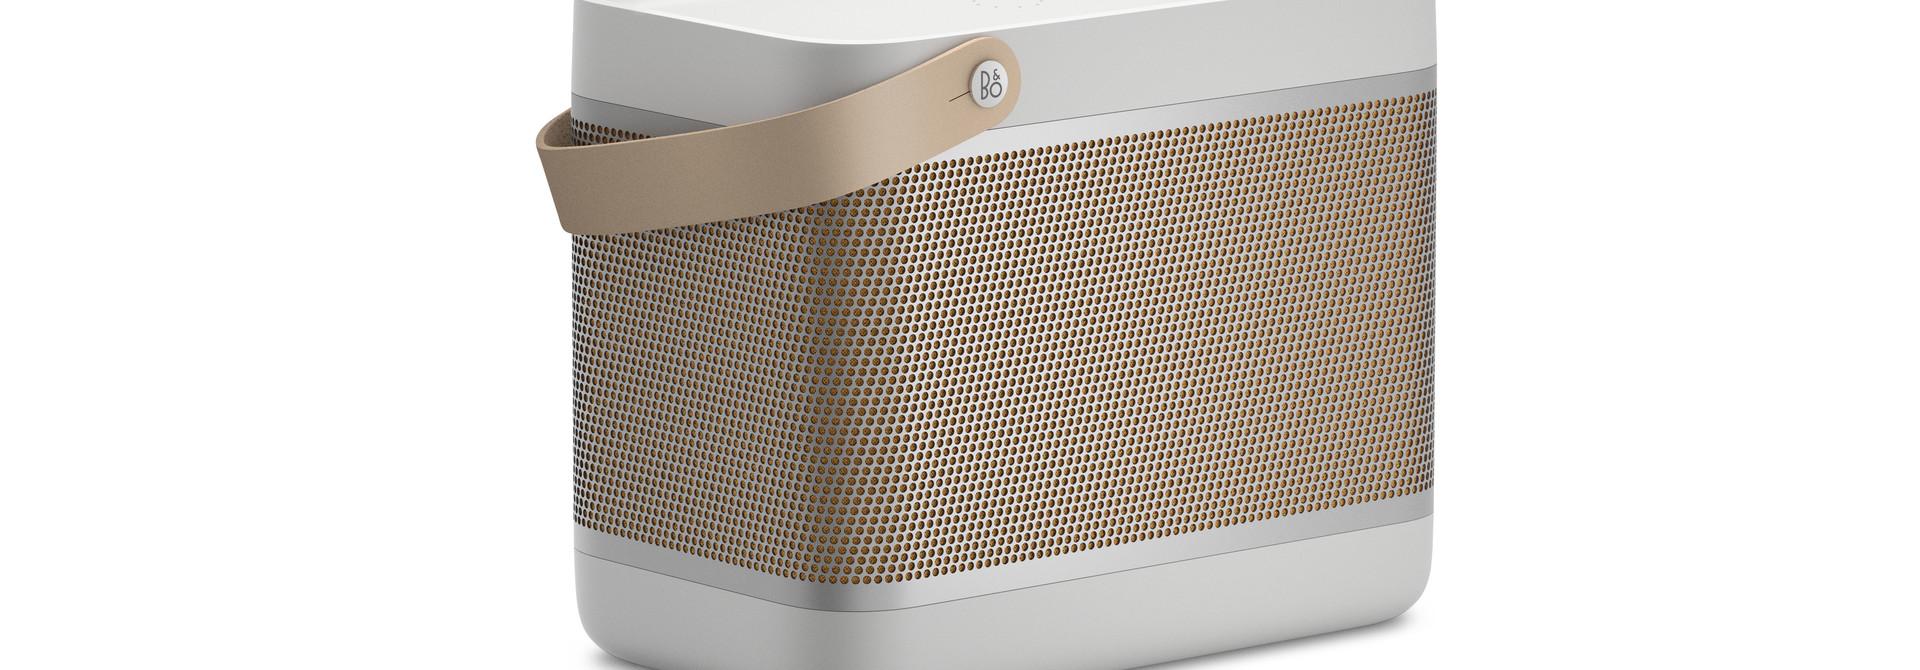 Bang & Olufsen BeoLit 20 Portable bluetooth speaker